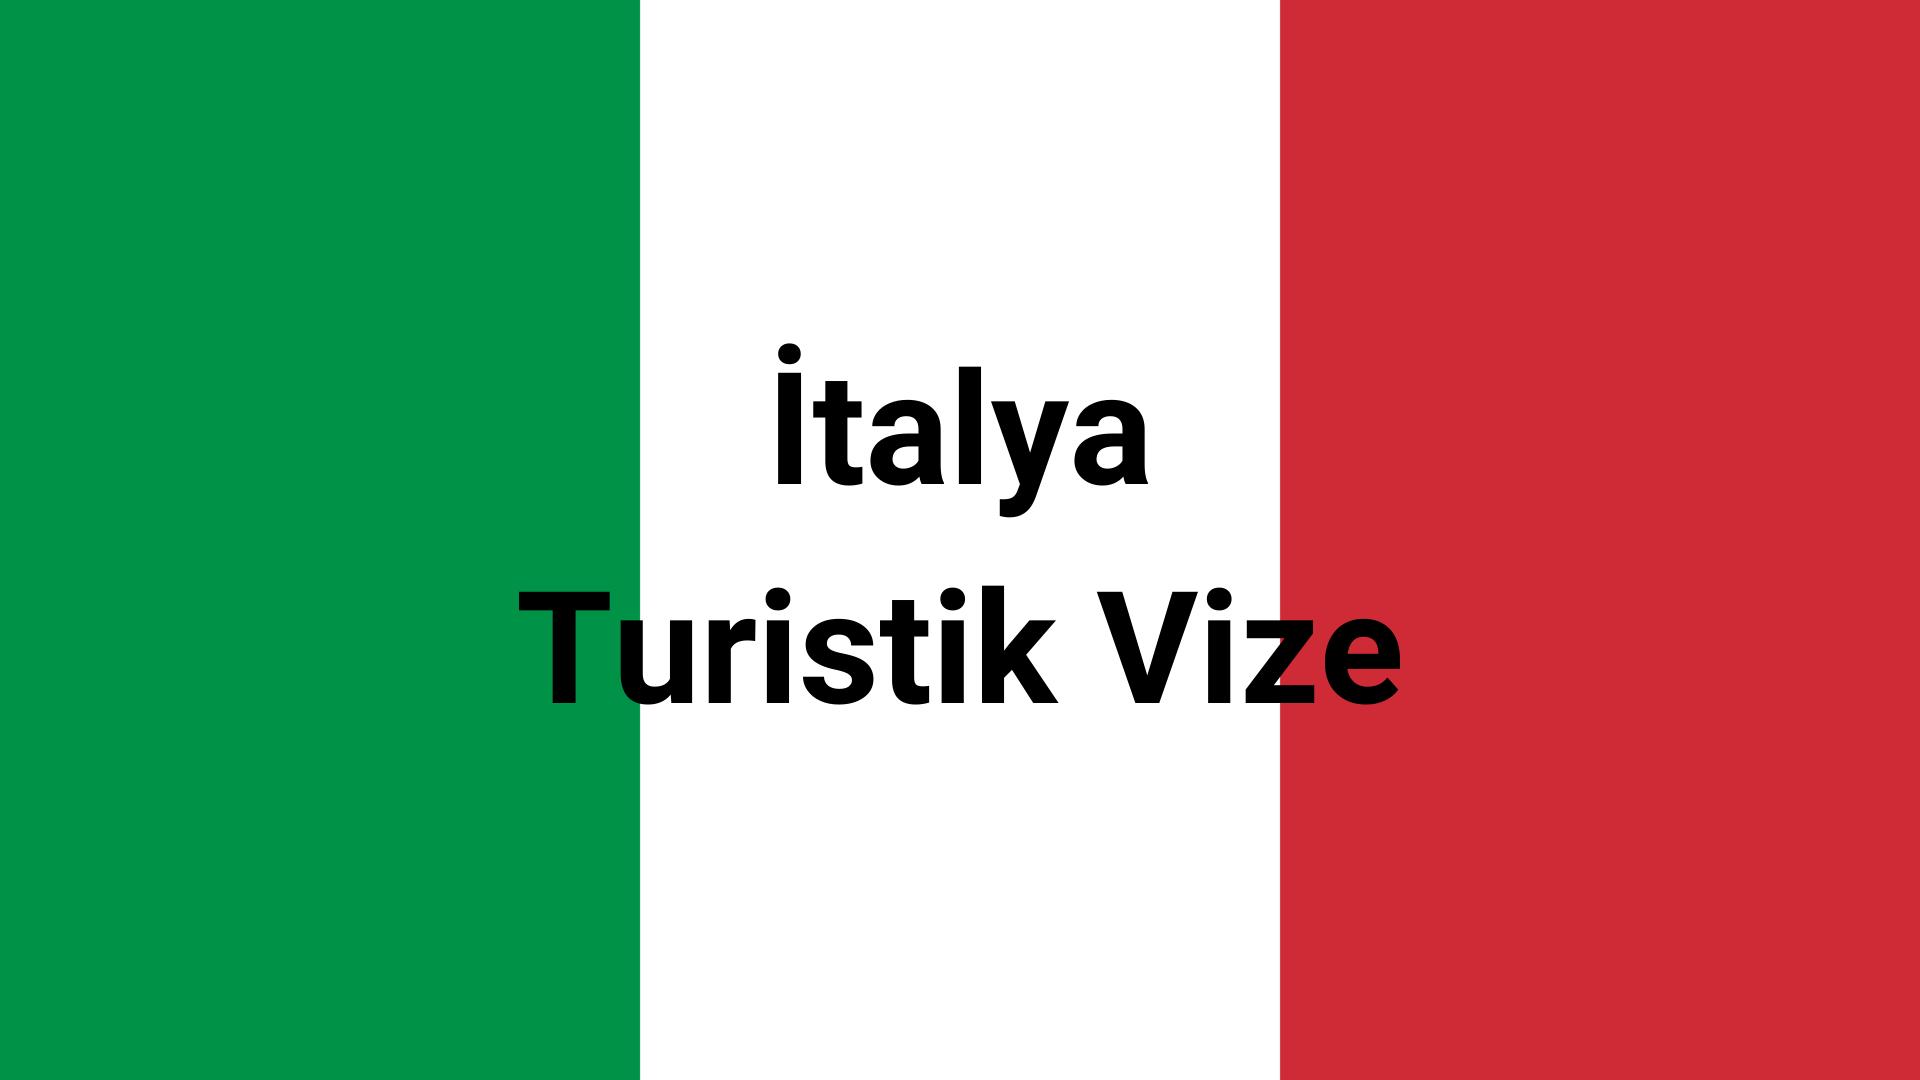 italya turistik vize